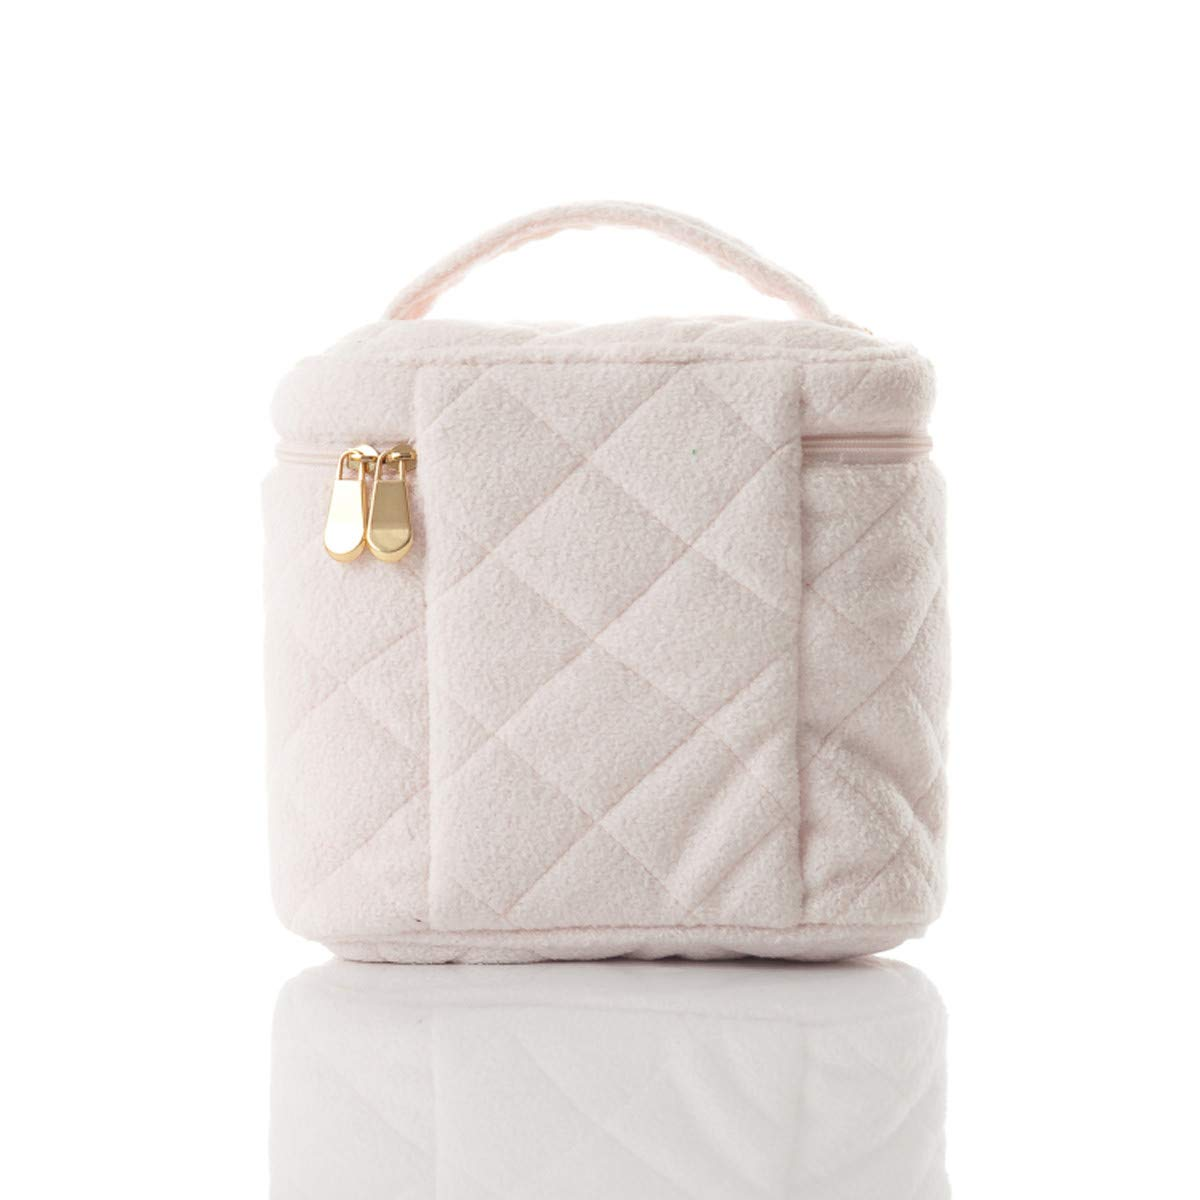 Wolegequ pearl velvet, velvet, velvet, ricami, manuale, cilindrica trousse, portatili portatrucco, la borsa, in borsa,rosa   Nuovi prodotti nel 2019    Acquisti online  e492d0